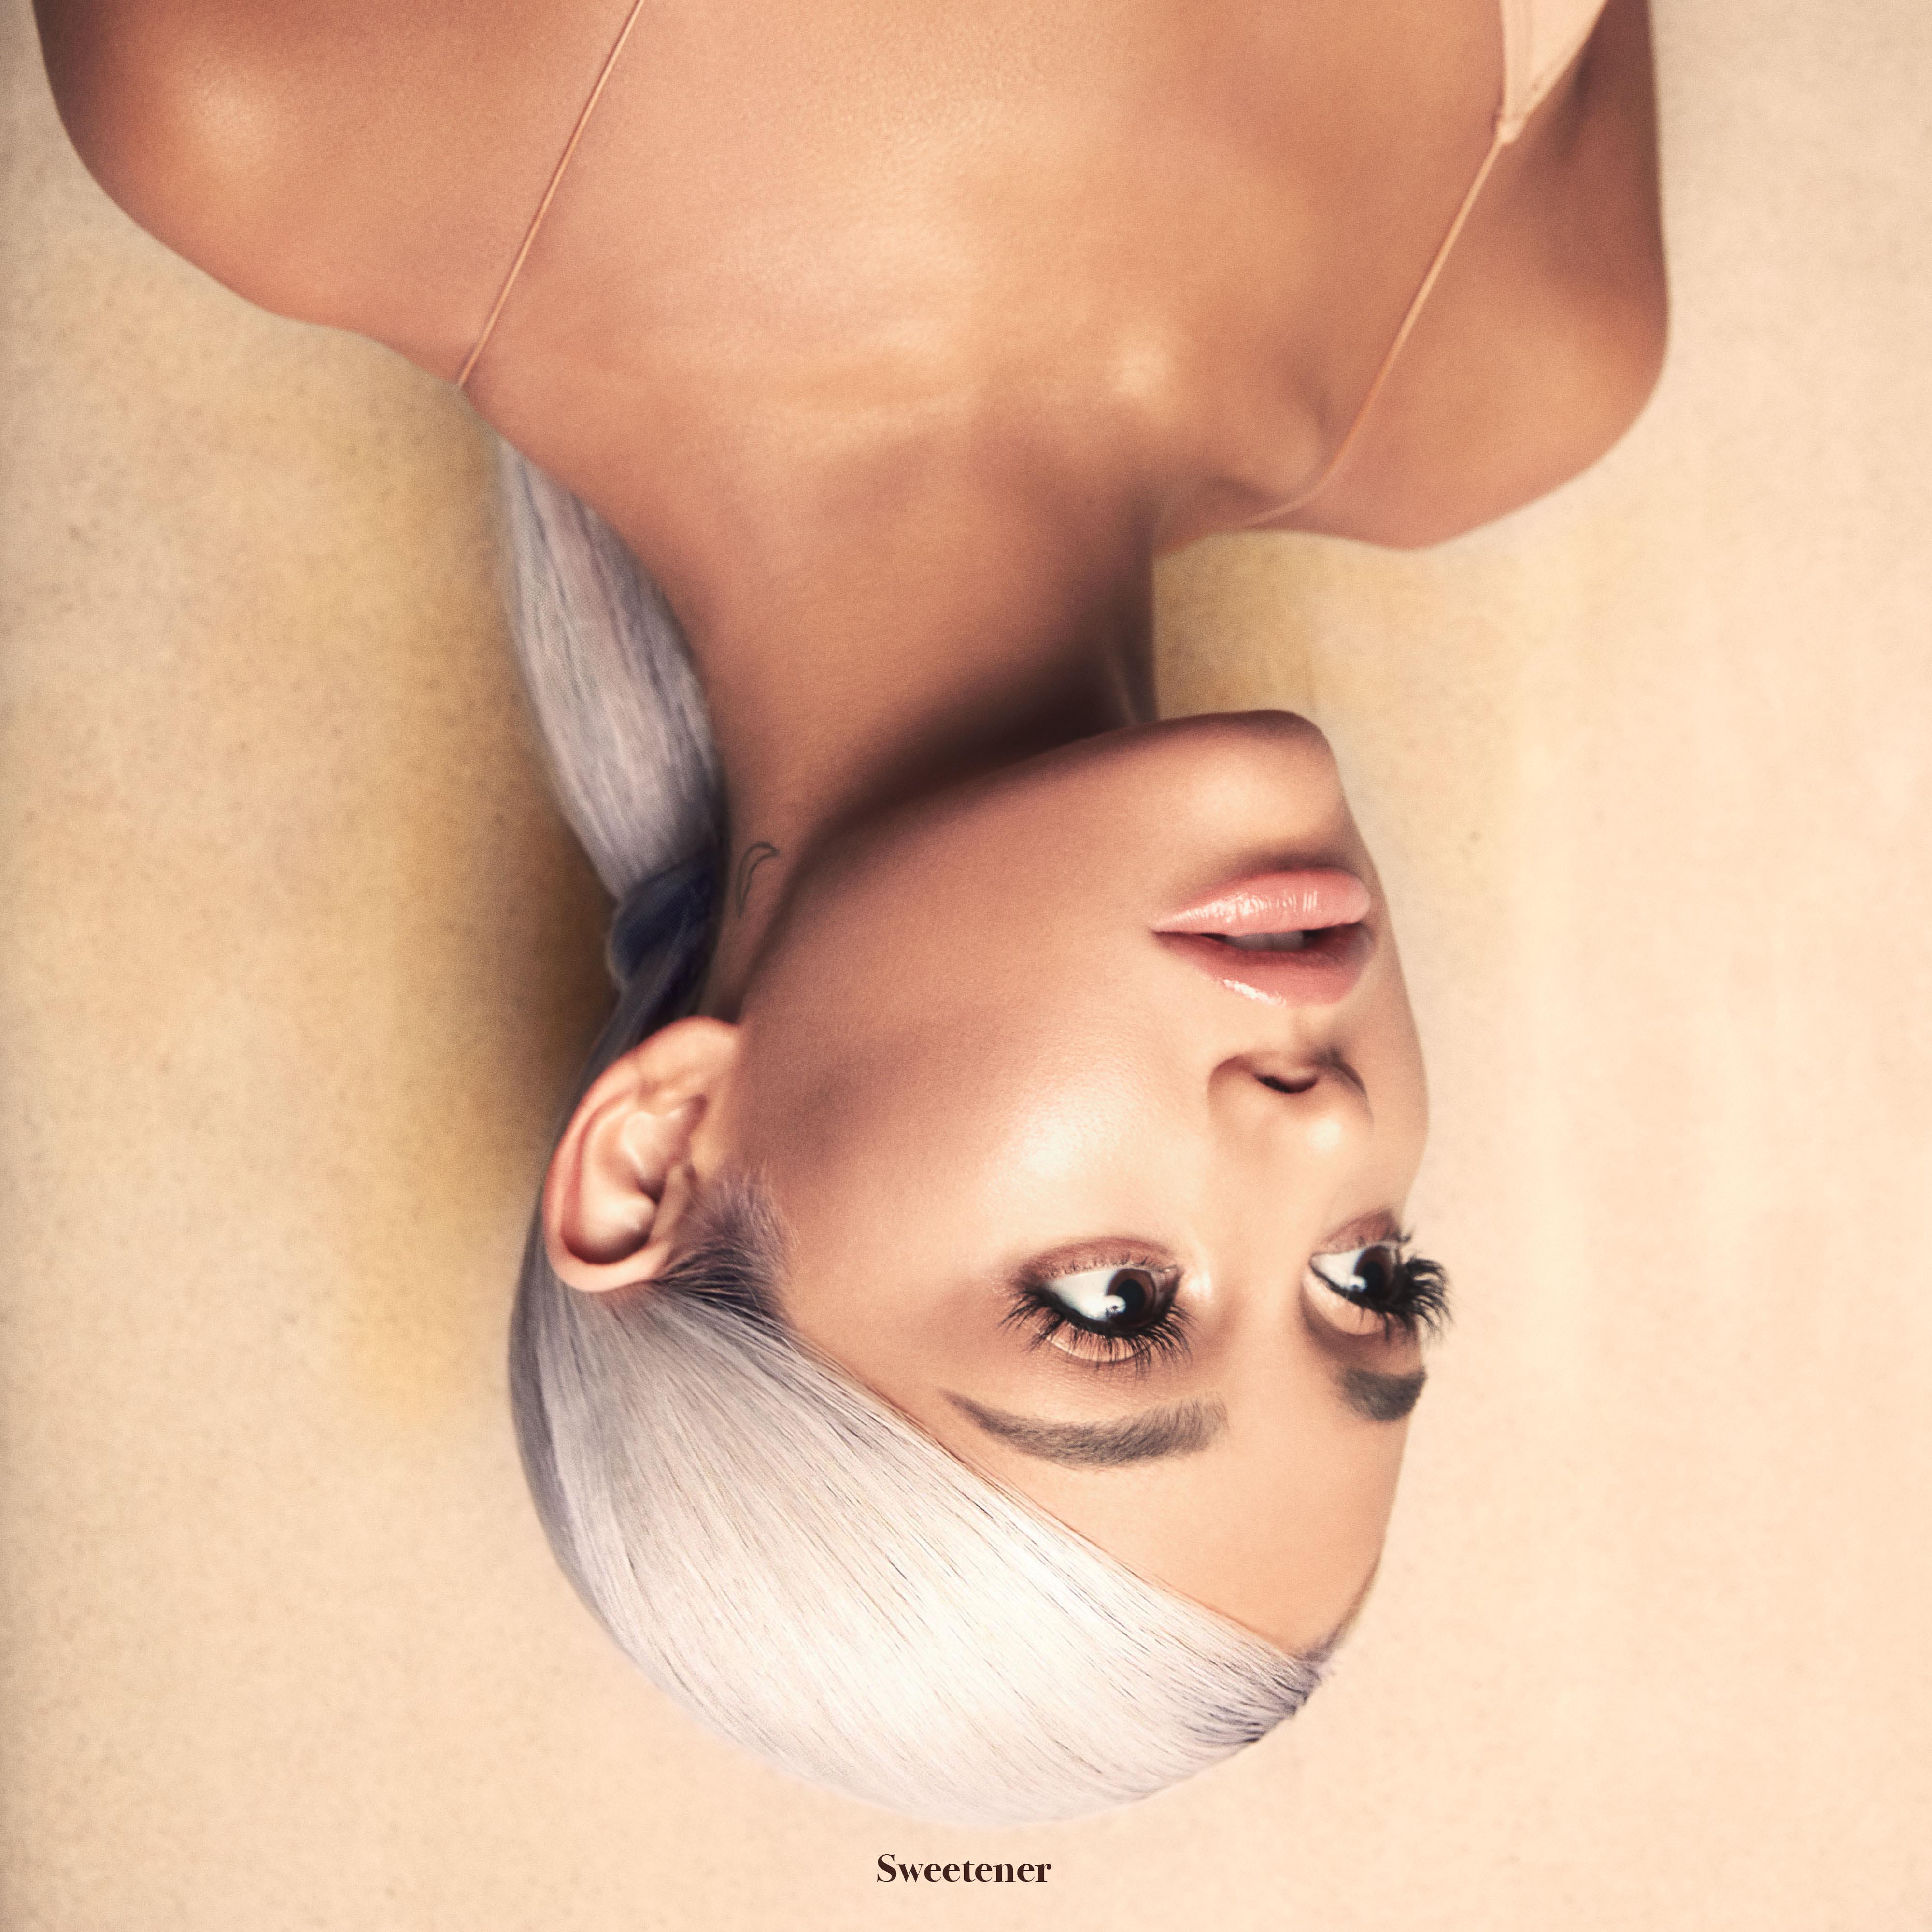 Ariana Grande_Sweetener_(album-cover)_4000x4000